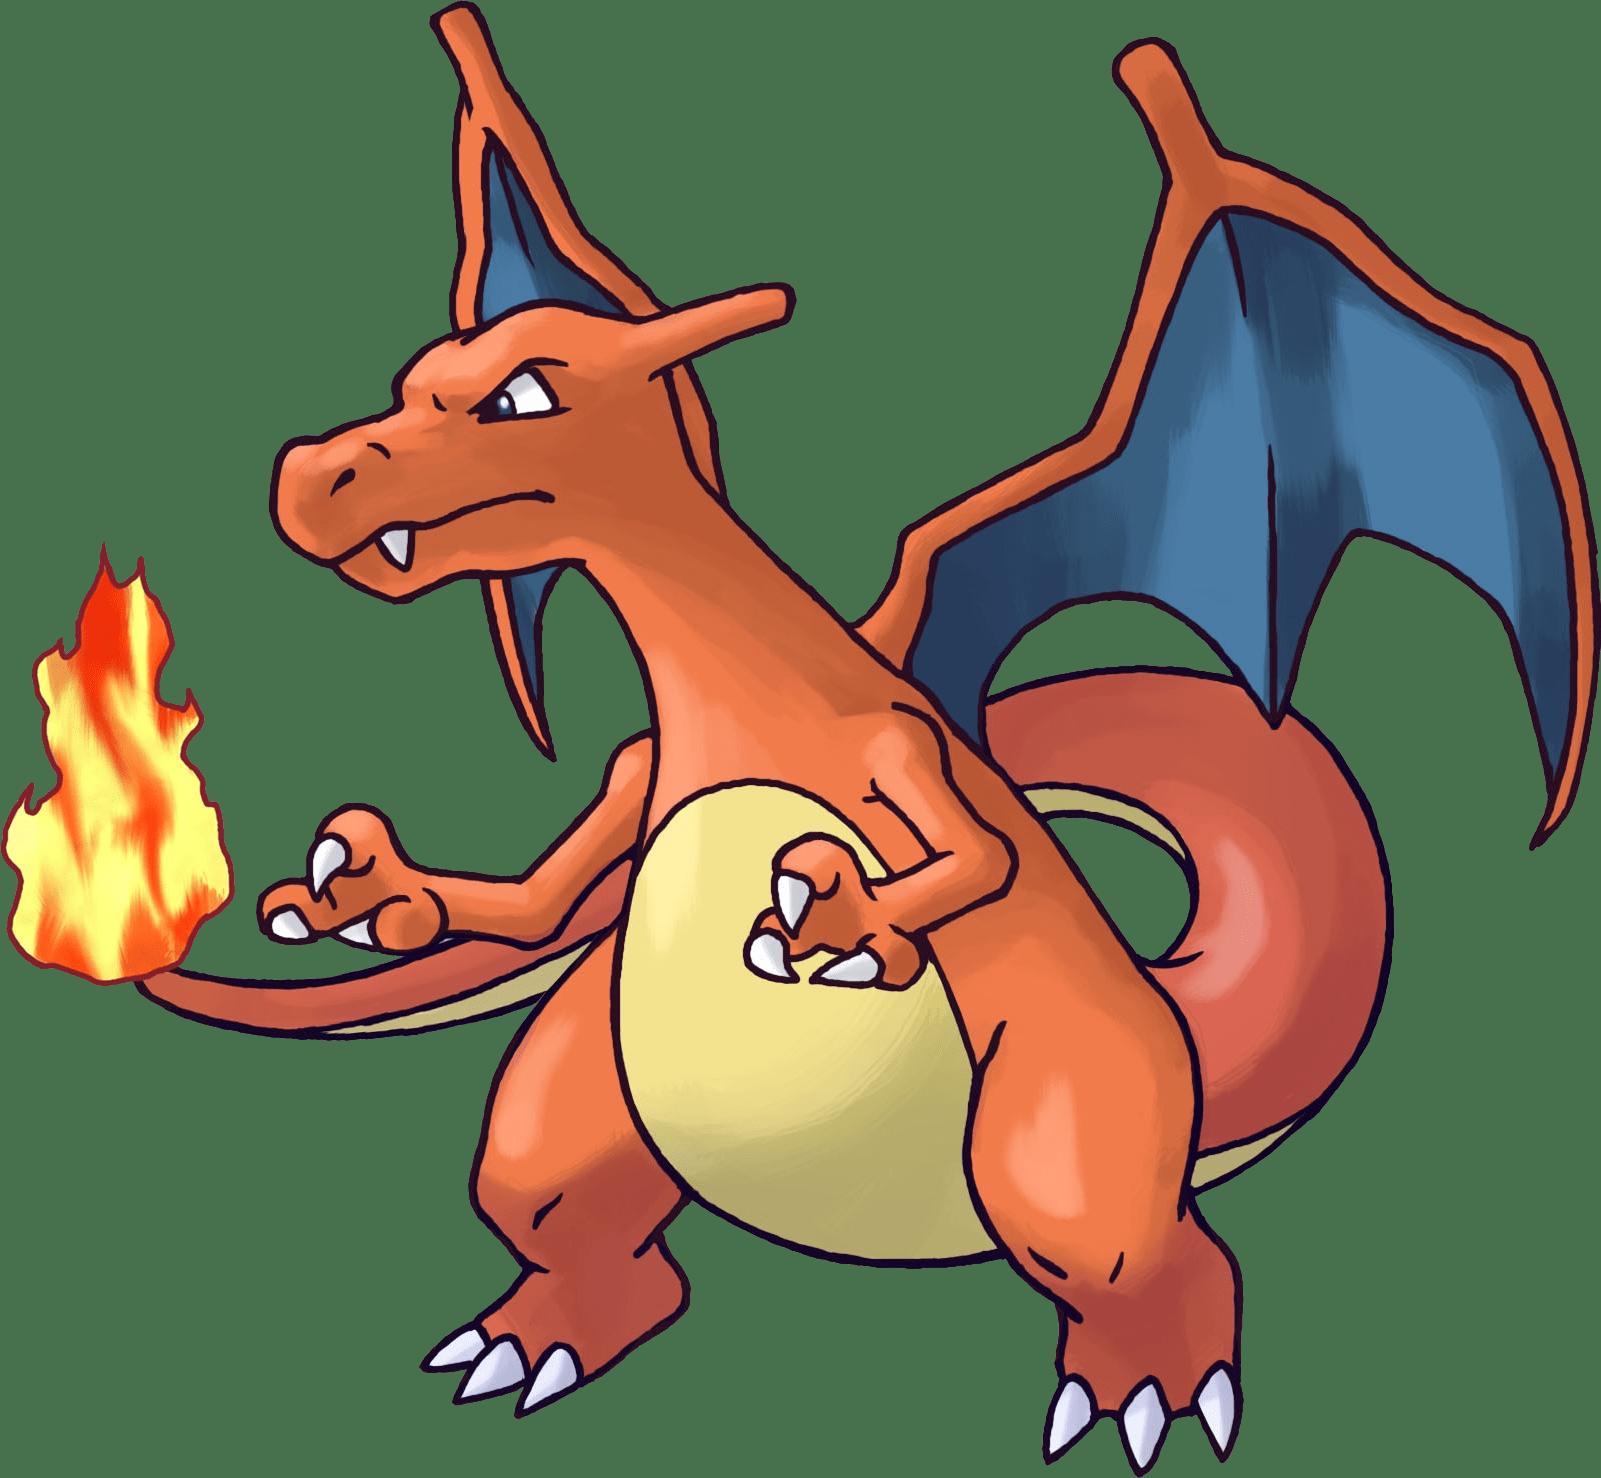 charizard pokemon transparent png stickpng